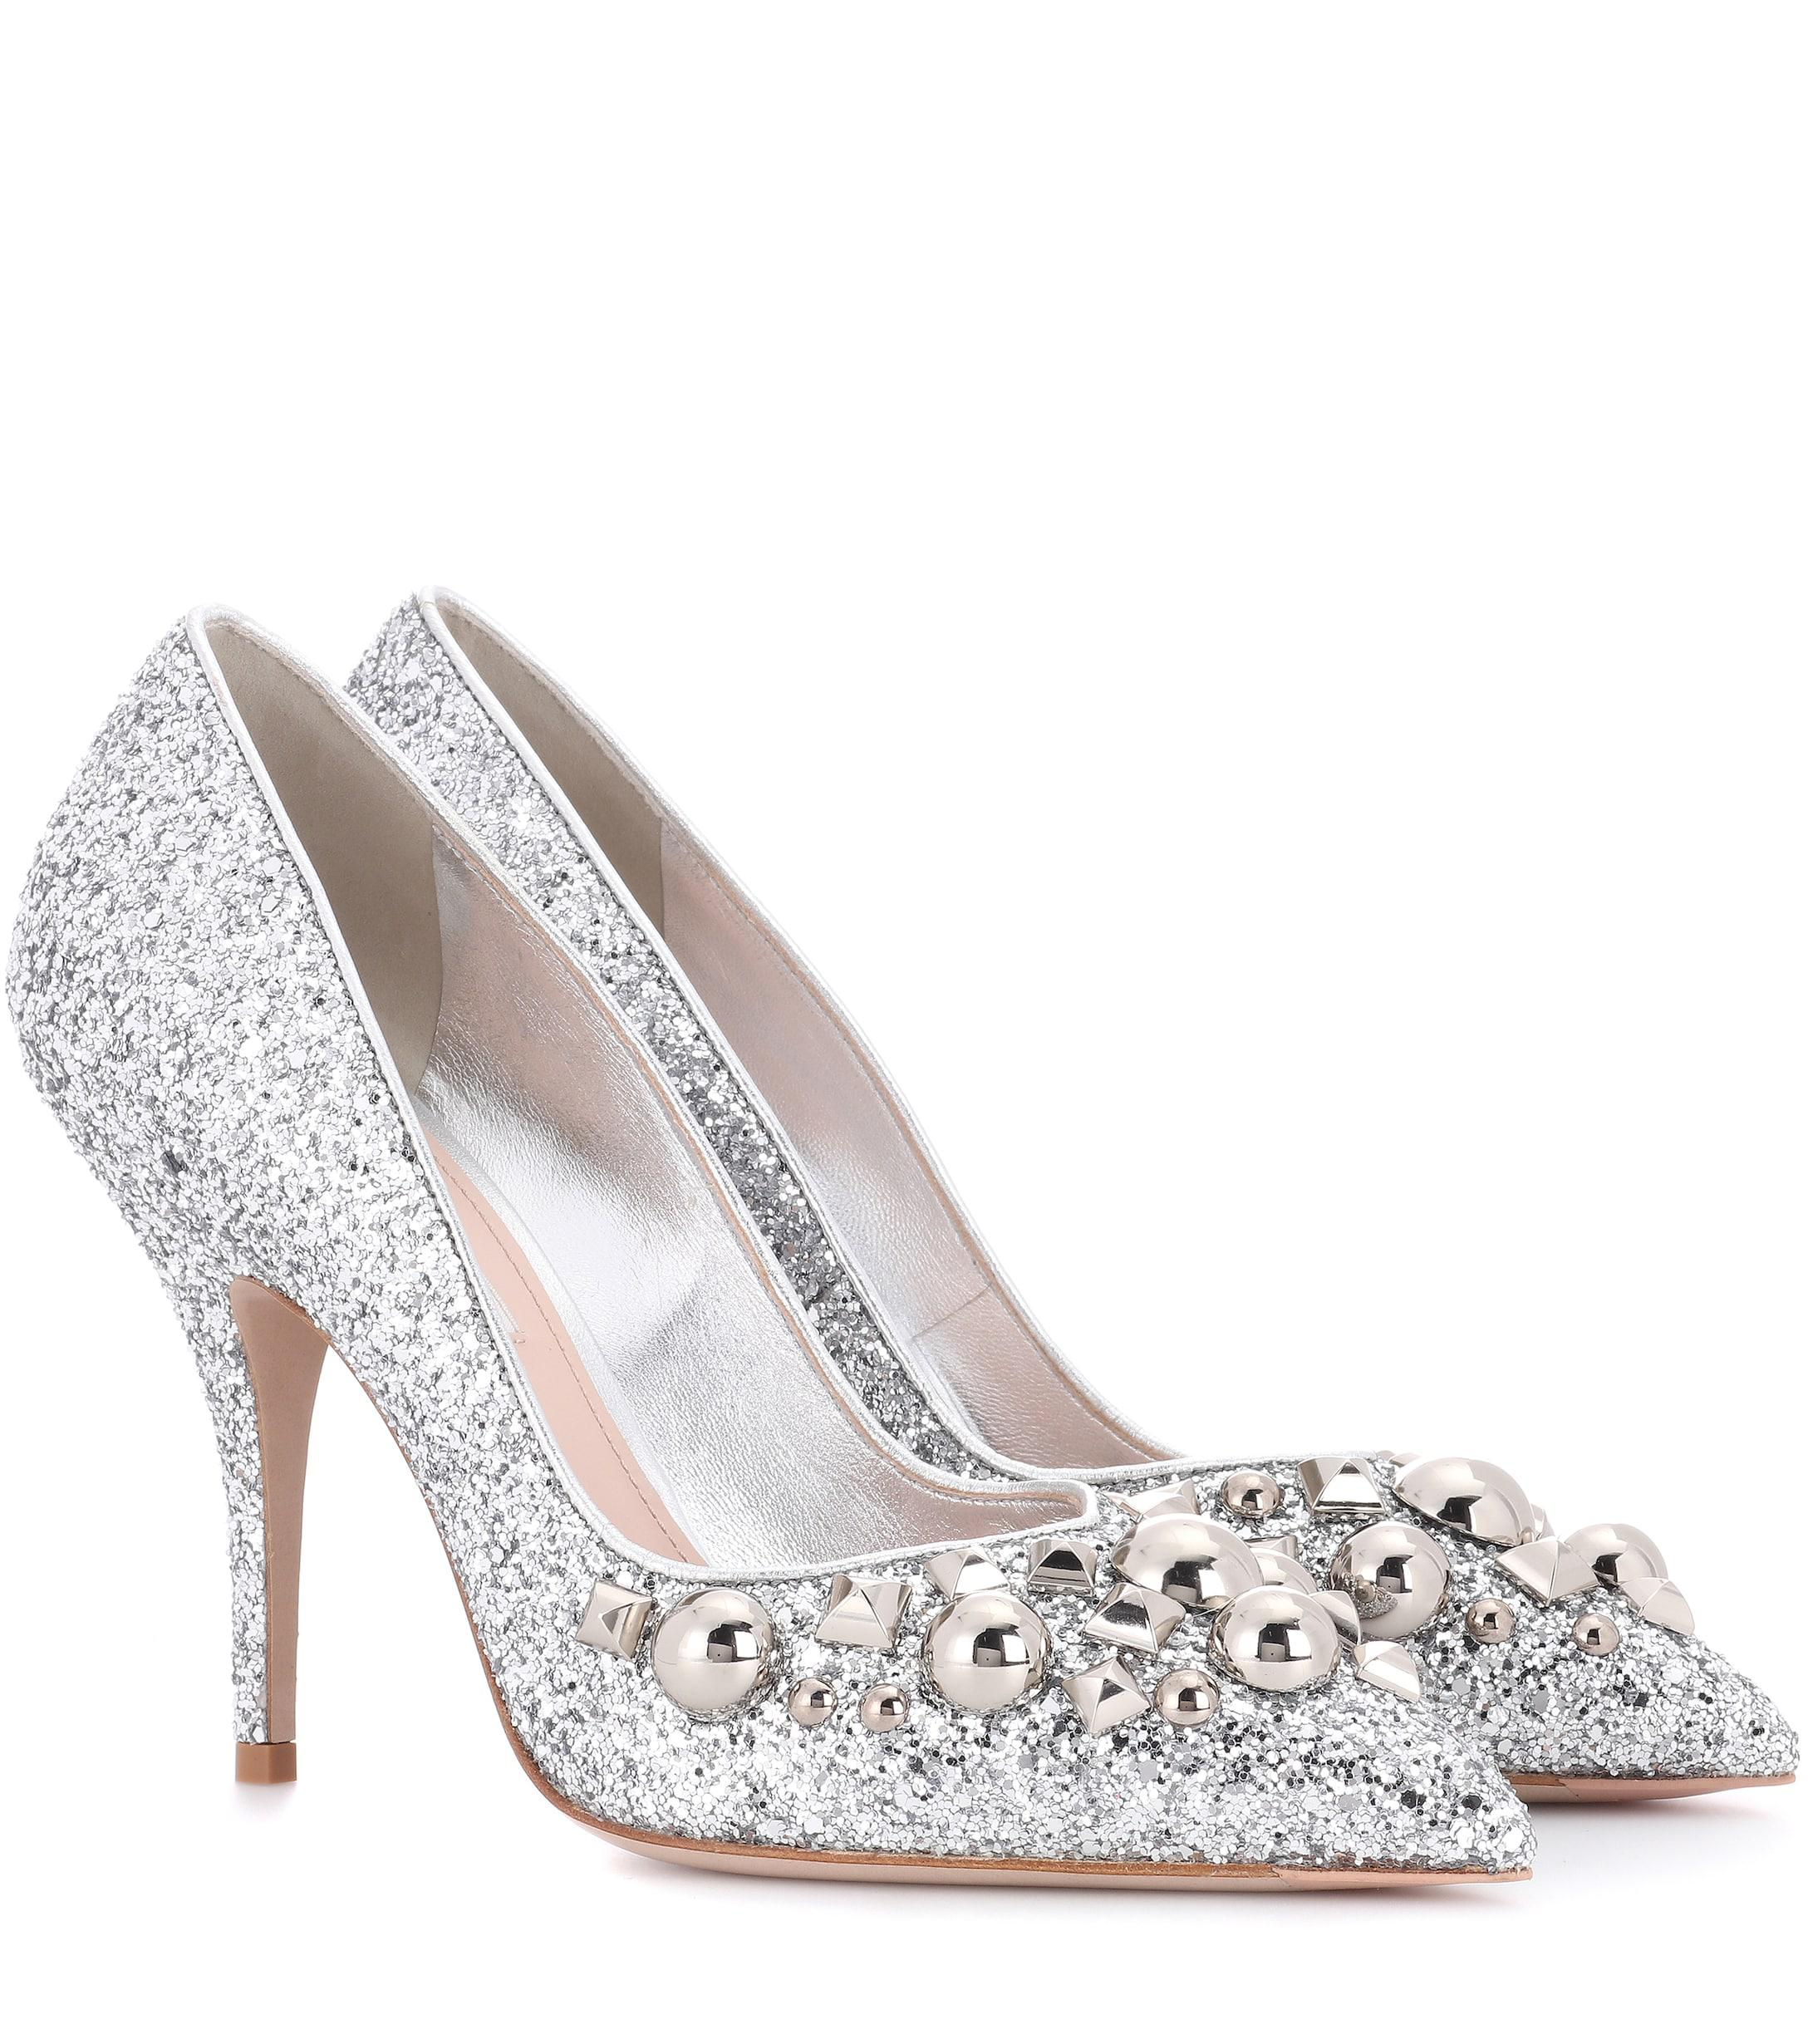 8f7a2dcf01b0 Miu Miu. Women s Metallic Studded Glitter Court Shoes. £525 From Mytheresa. Free  shipping ...